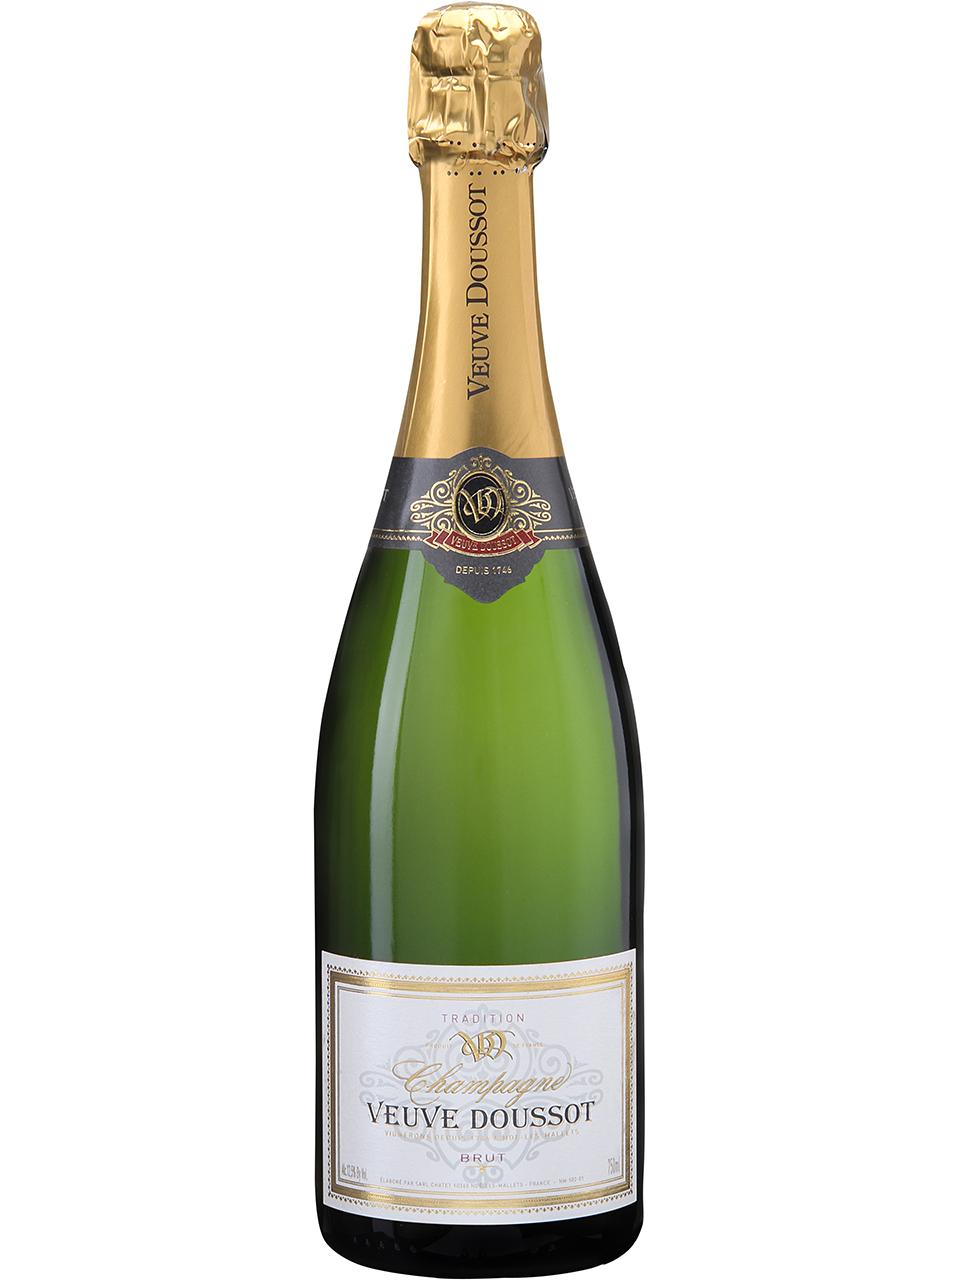 Champagne Veuve Doussot Brut Tradition